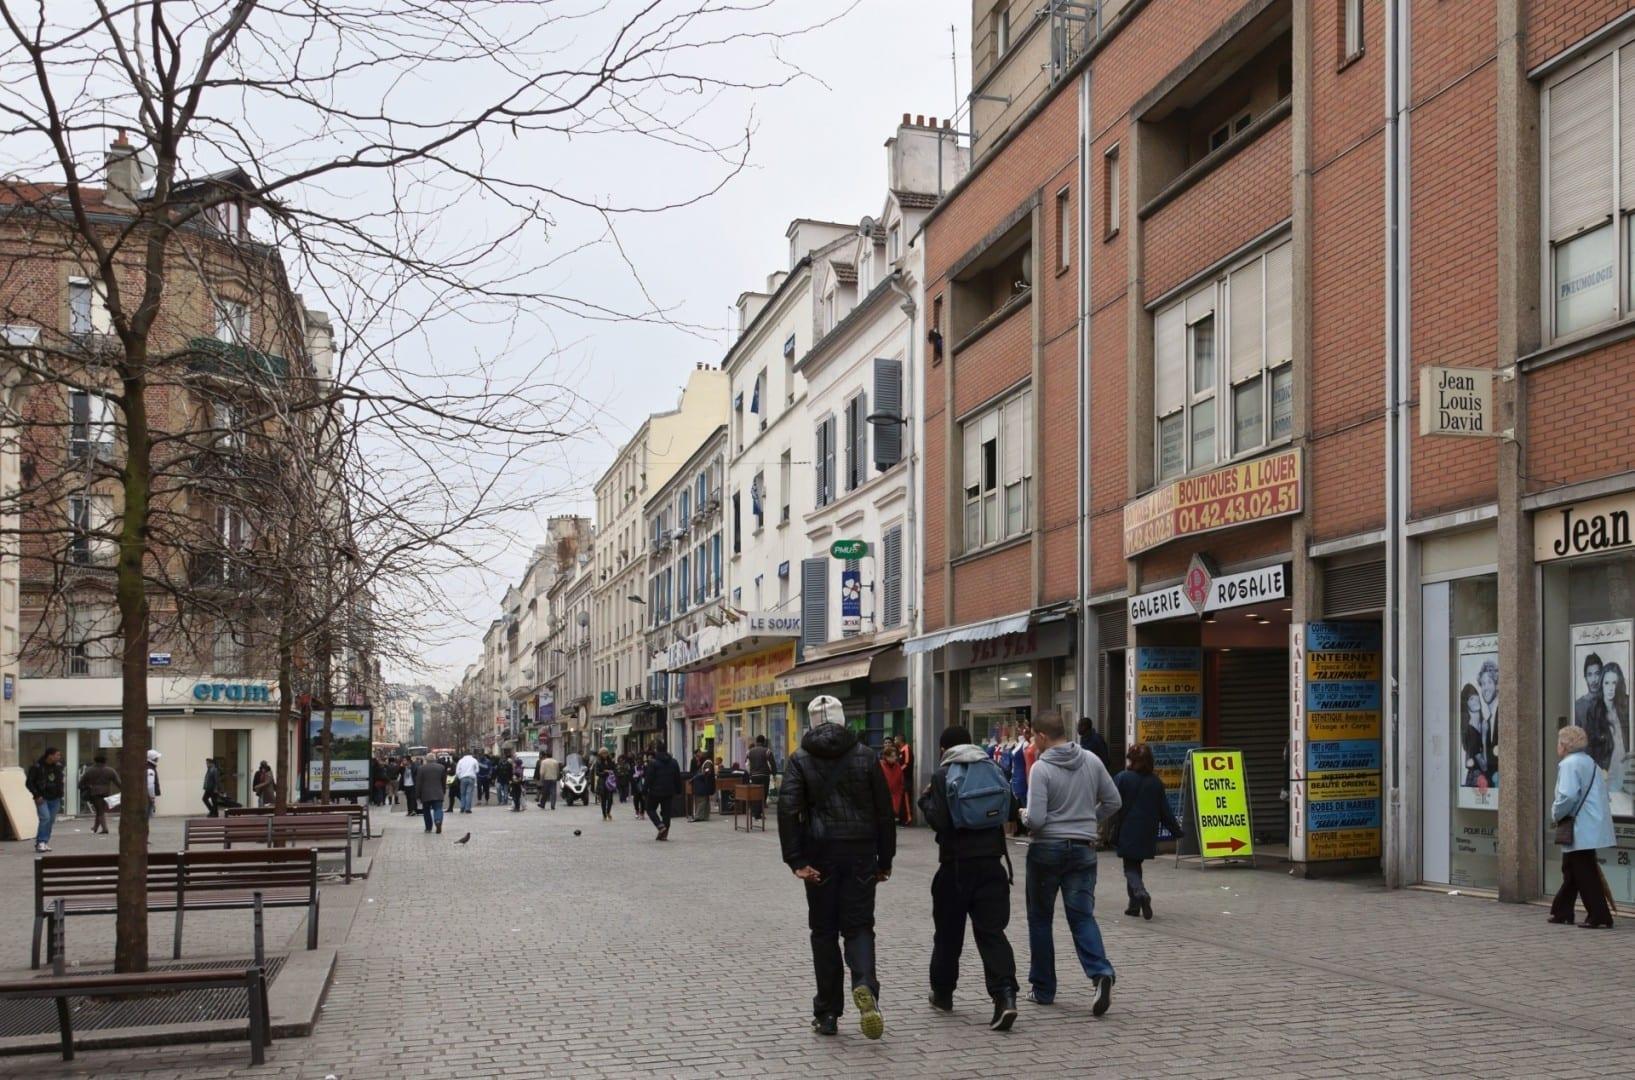 La calle peatonal Gabriel-Peri Saint-Denis Francia